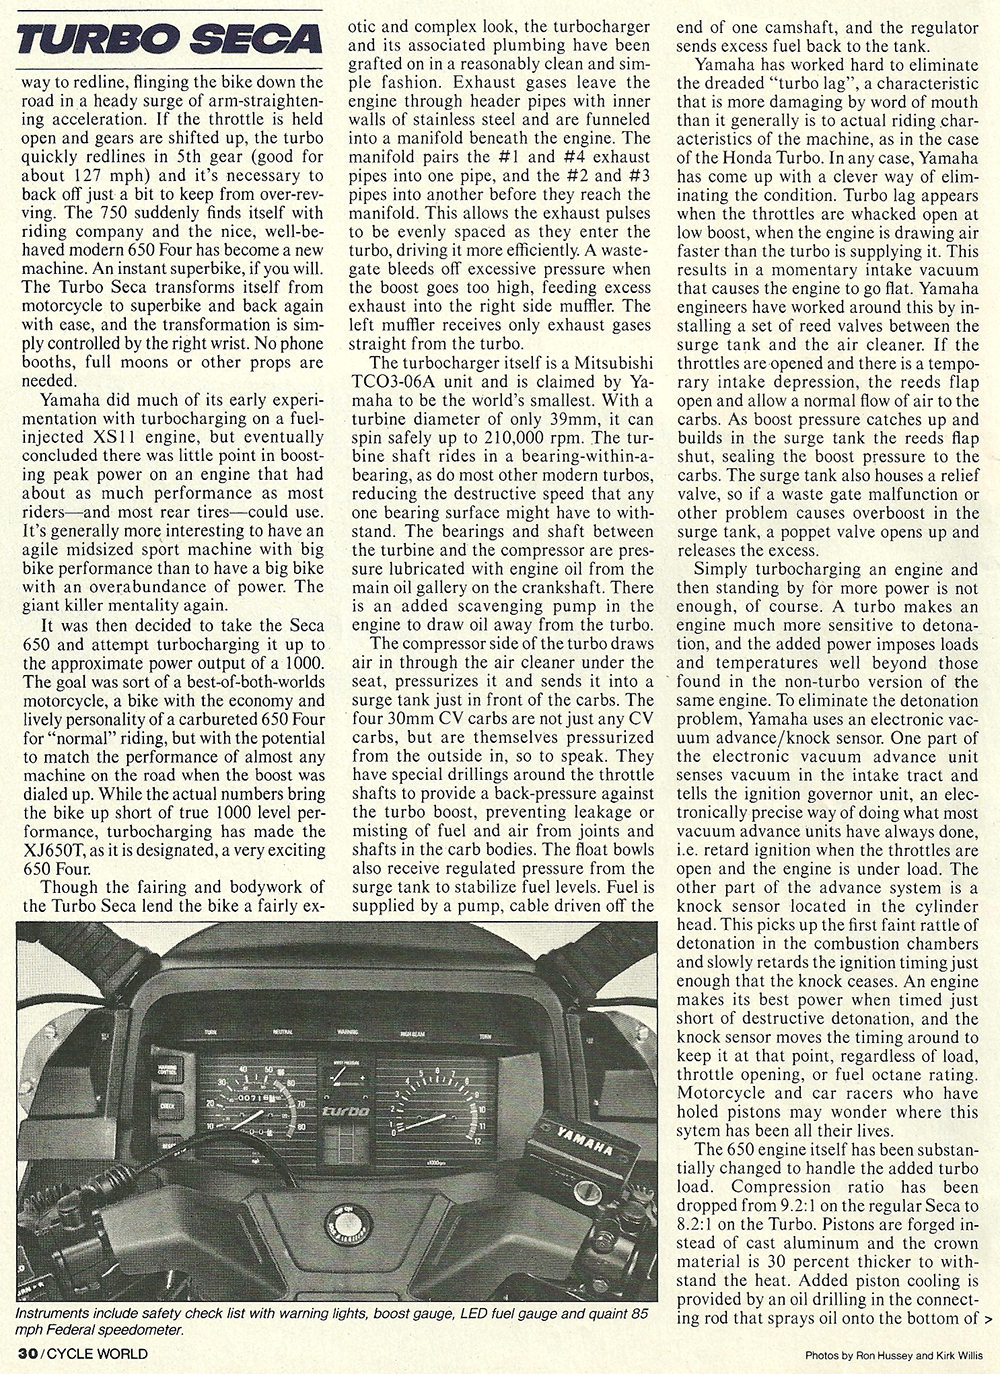 1982 Yamaha Turbo Seca 650 road test 03.jpg